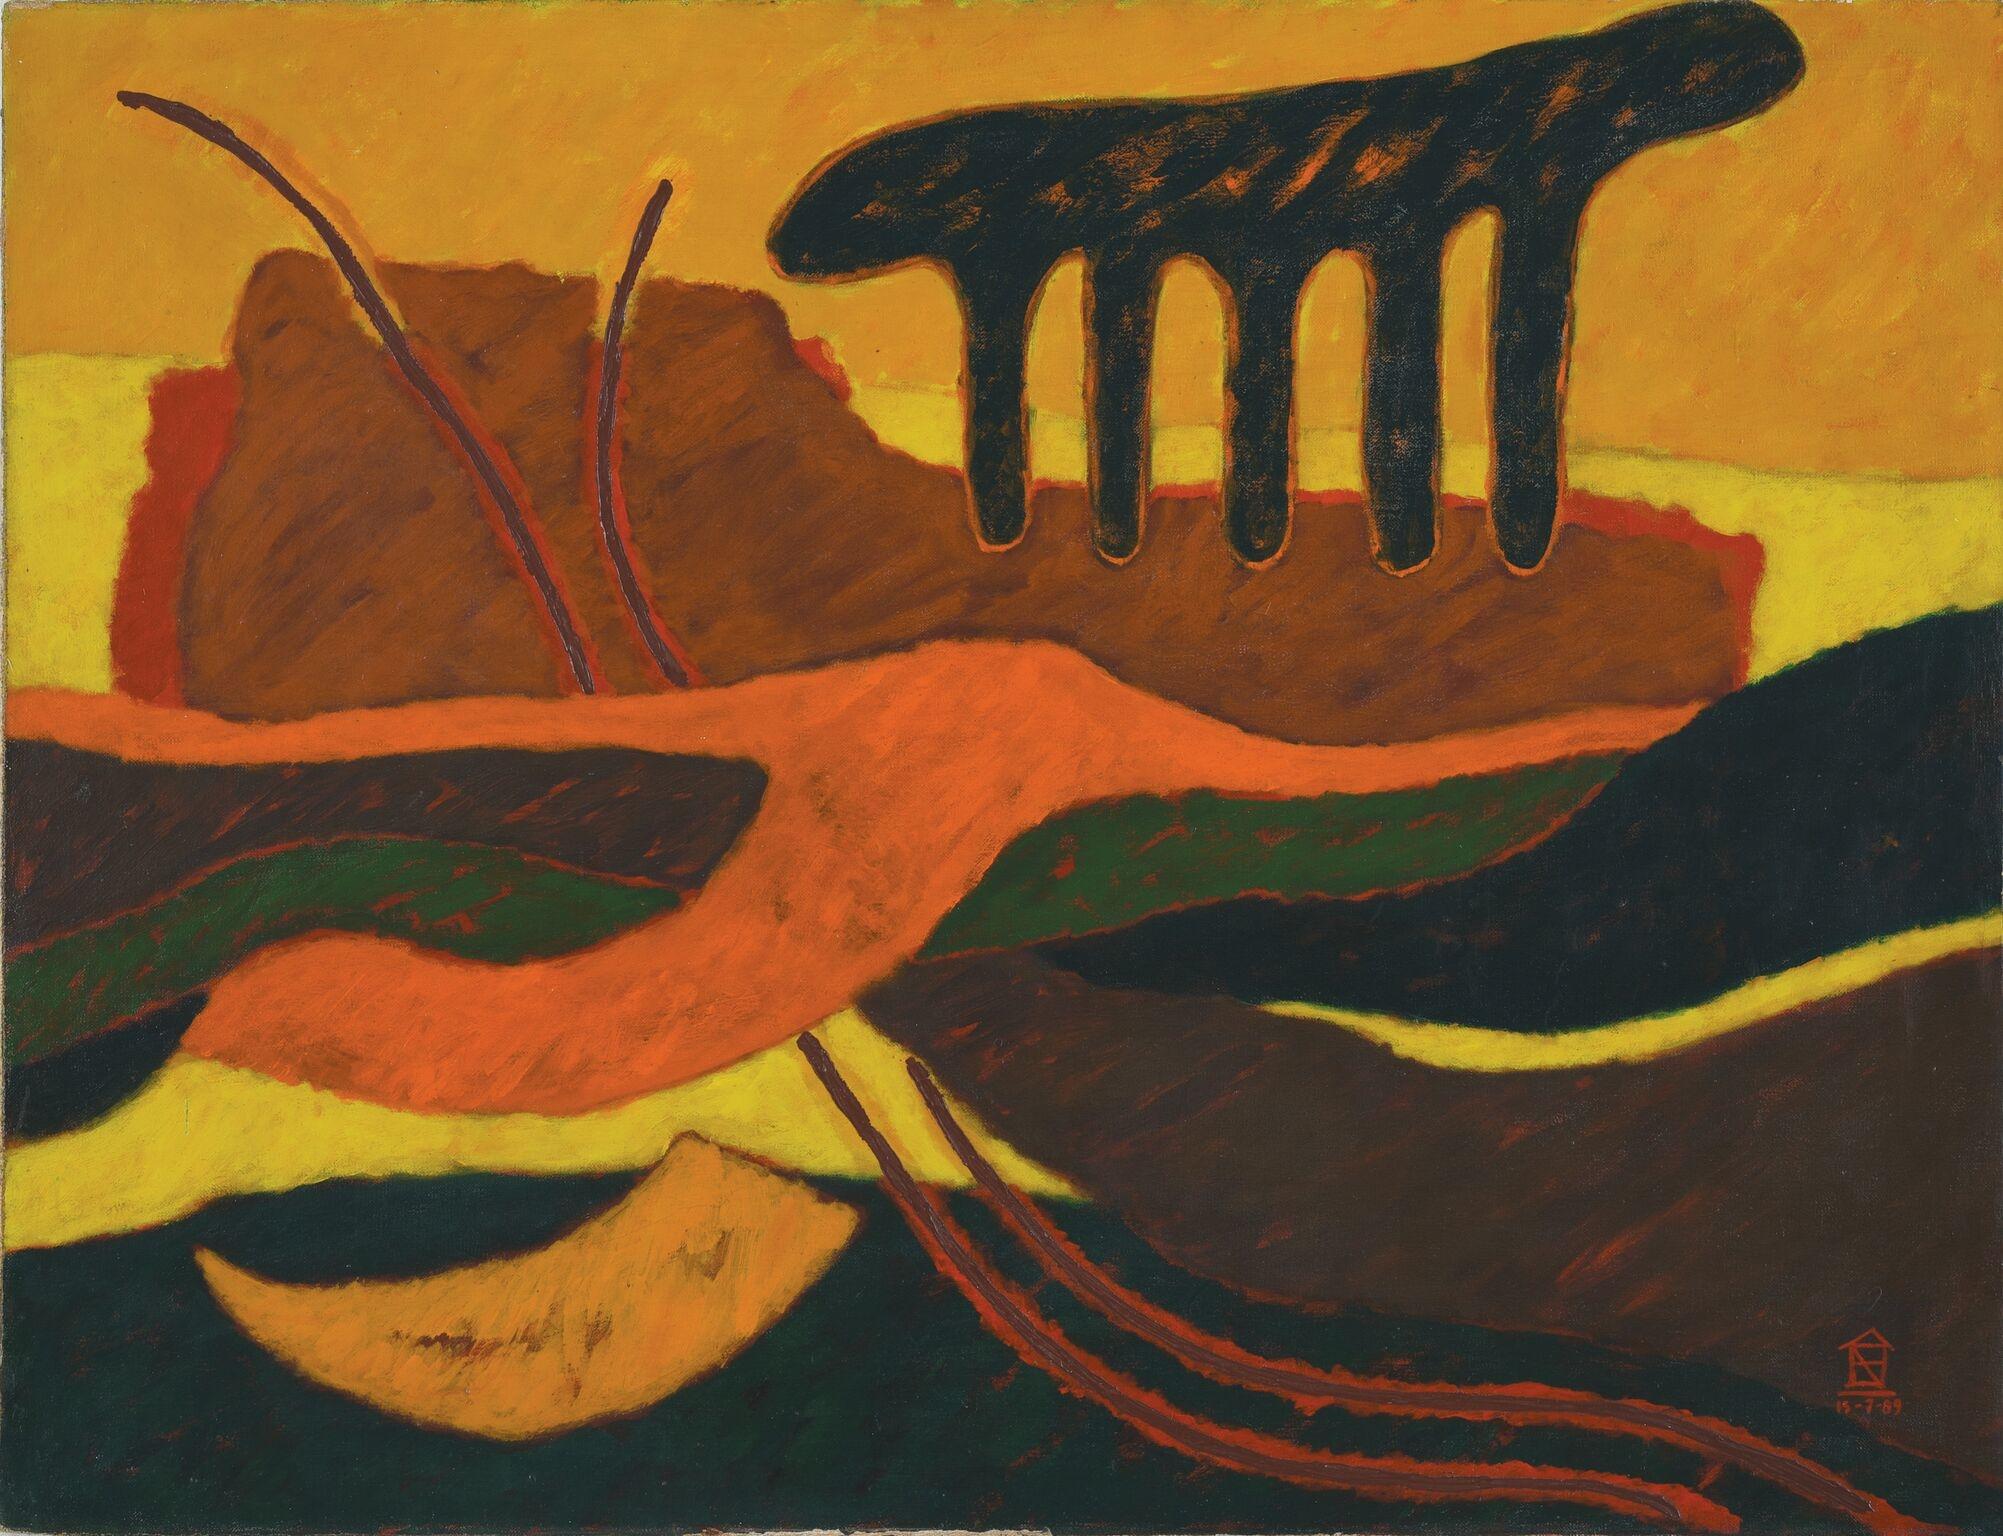 Nashar, Irama, oil on canvas, 70 x 91 cm, 1989